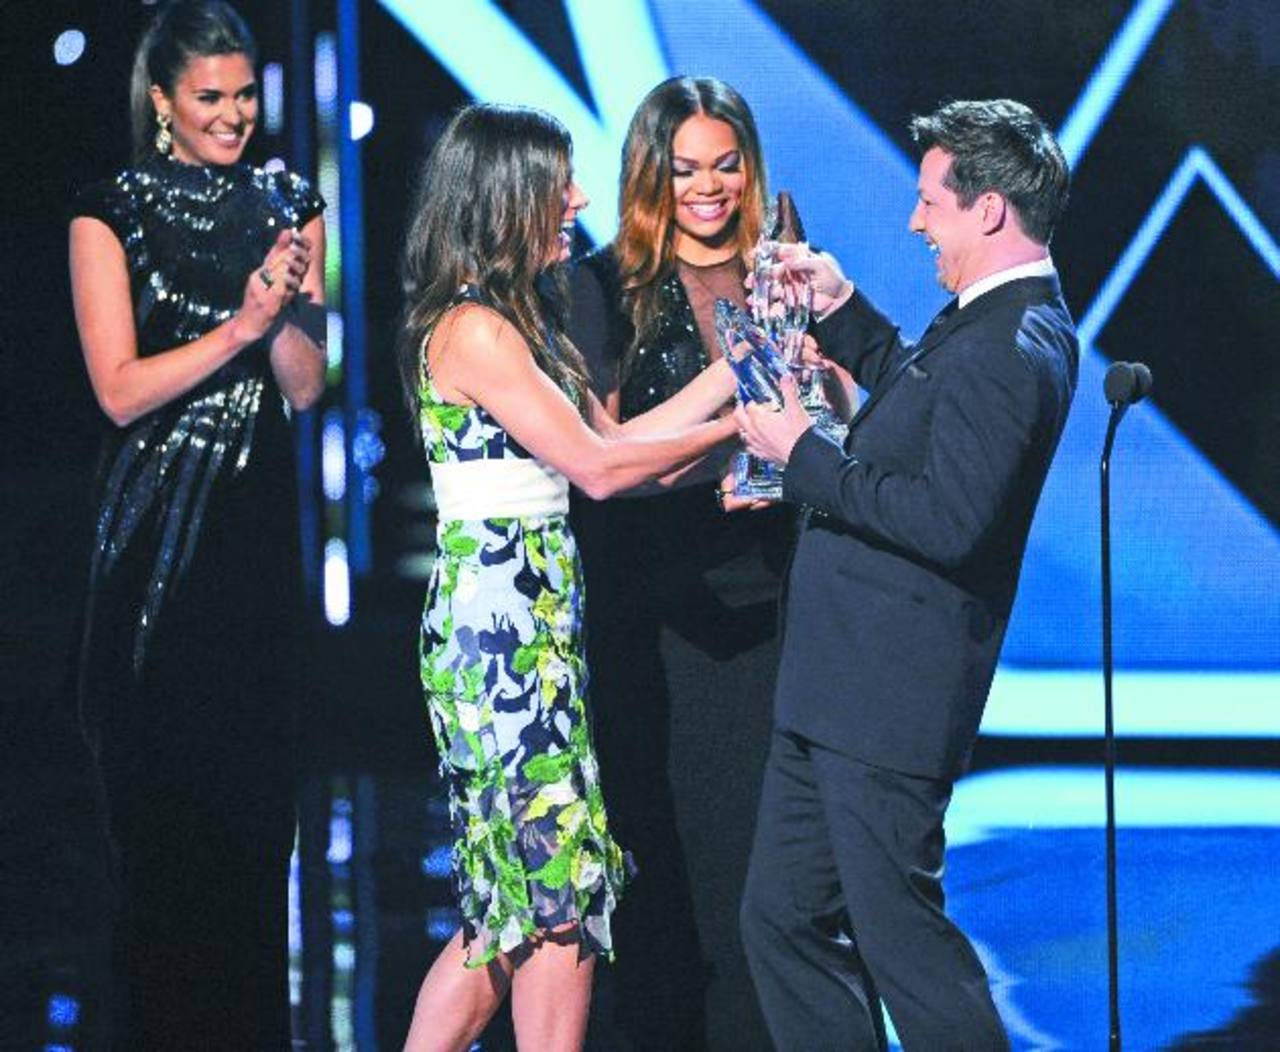 Sandra Bullock recibió sus múltiples premios durante la ceremonia.